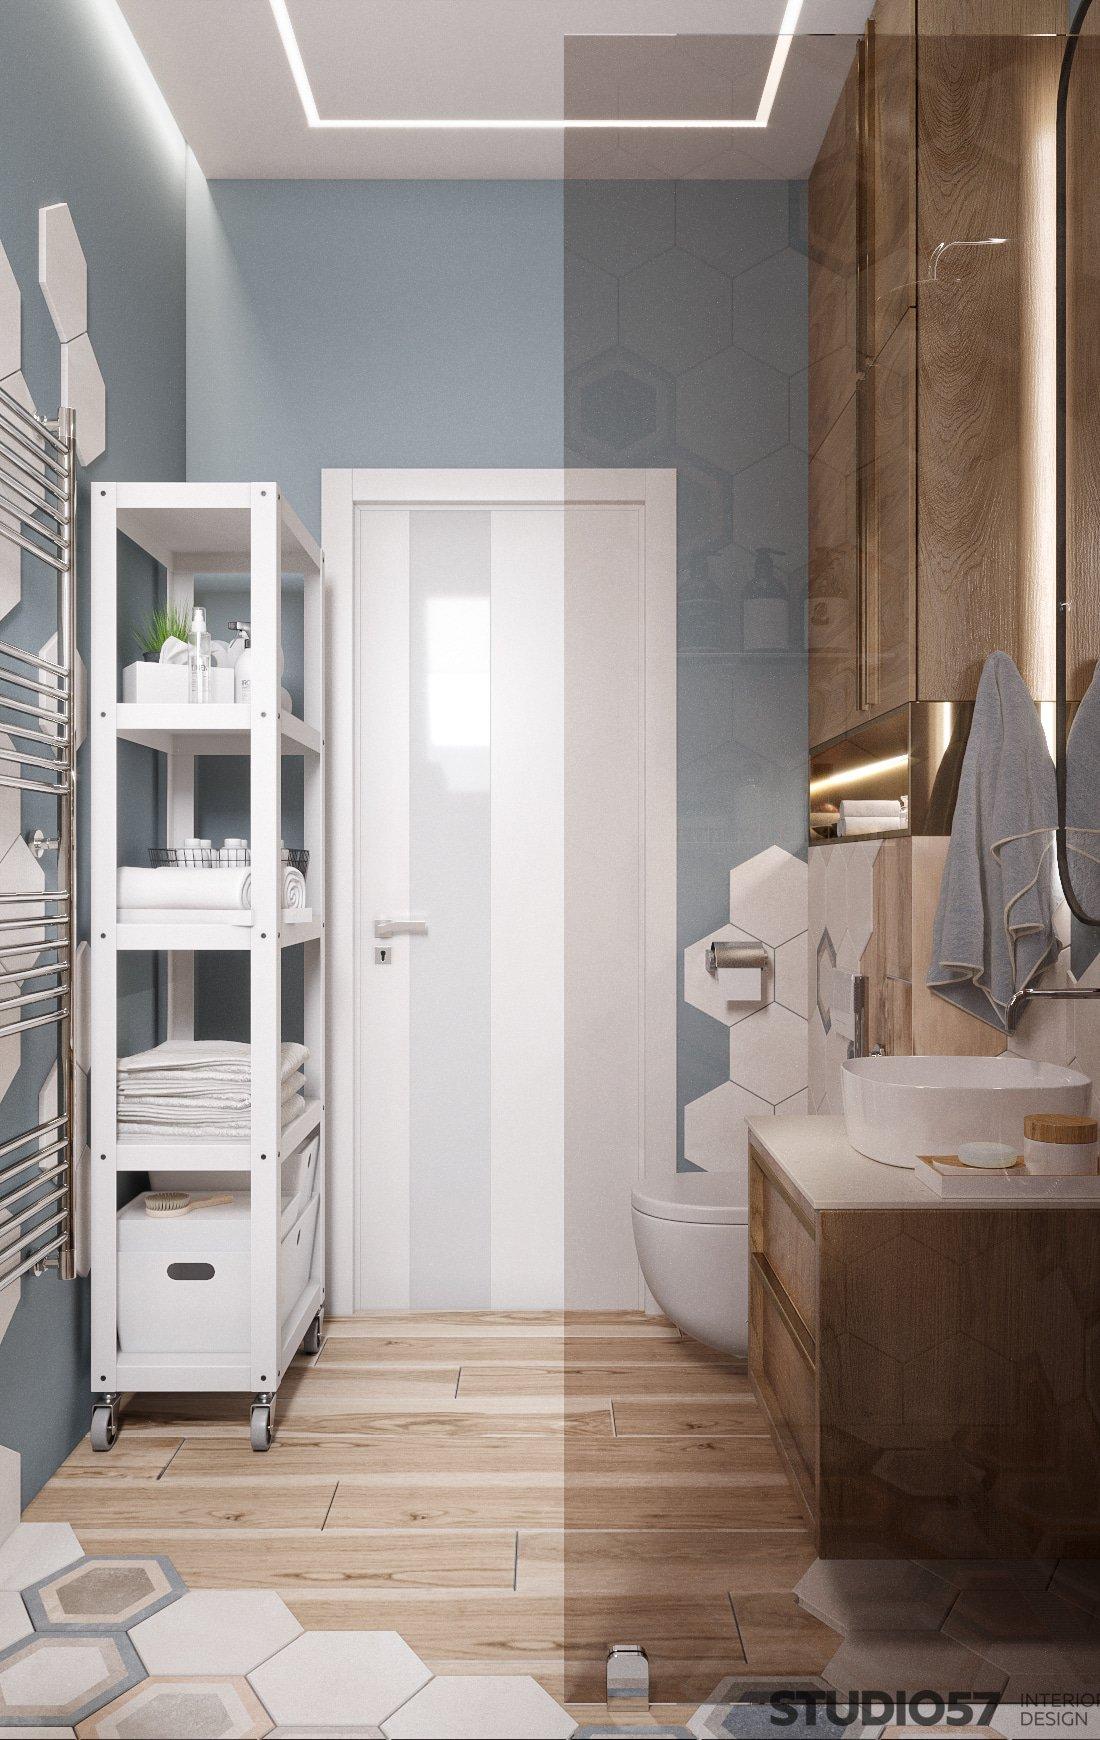 Contemporary style in bathroom design photo